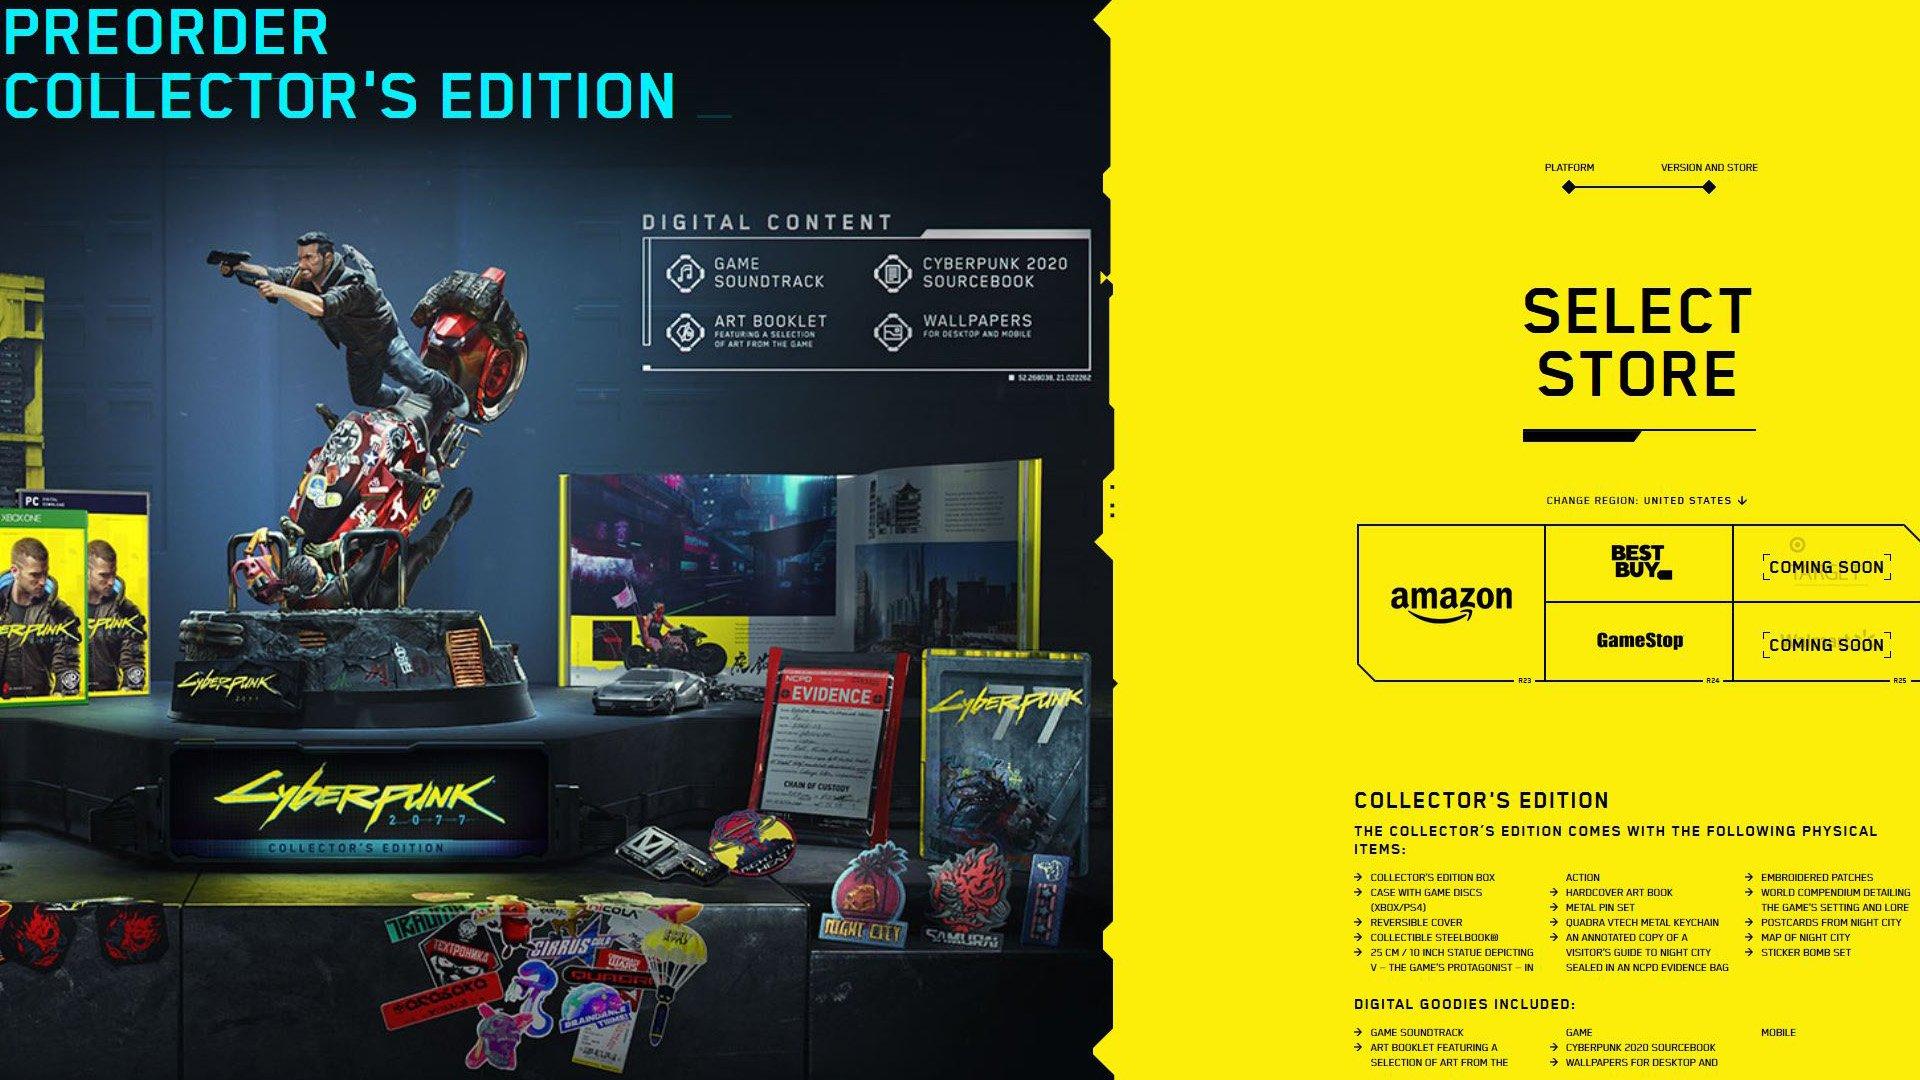 Cyberpunk 2077 Collector's Edition Pre-Order